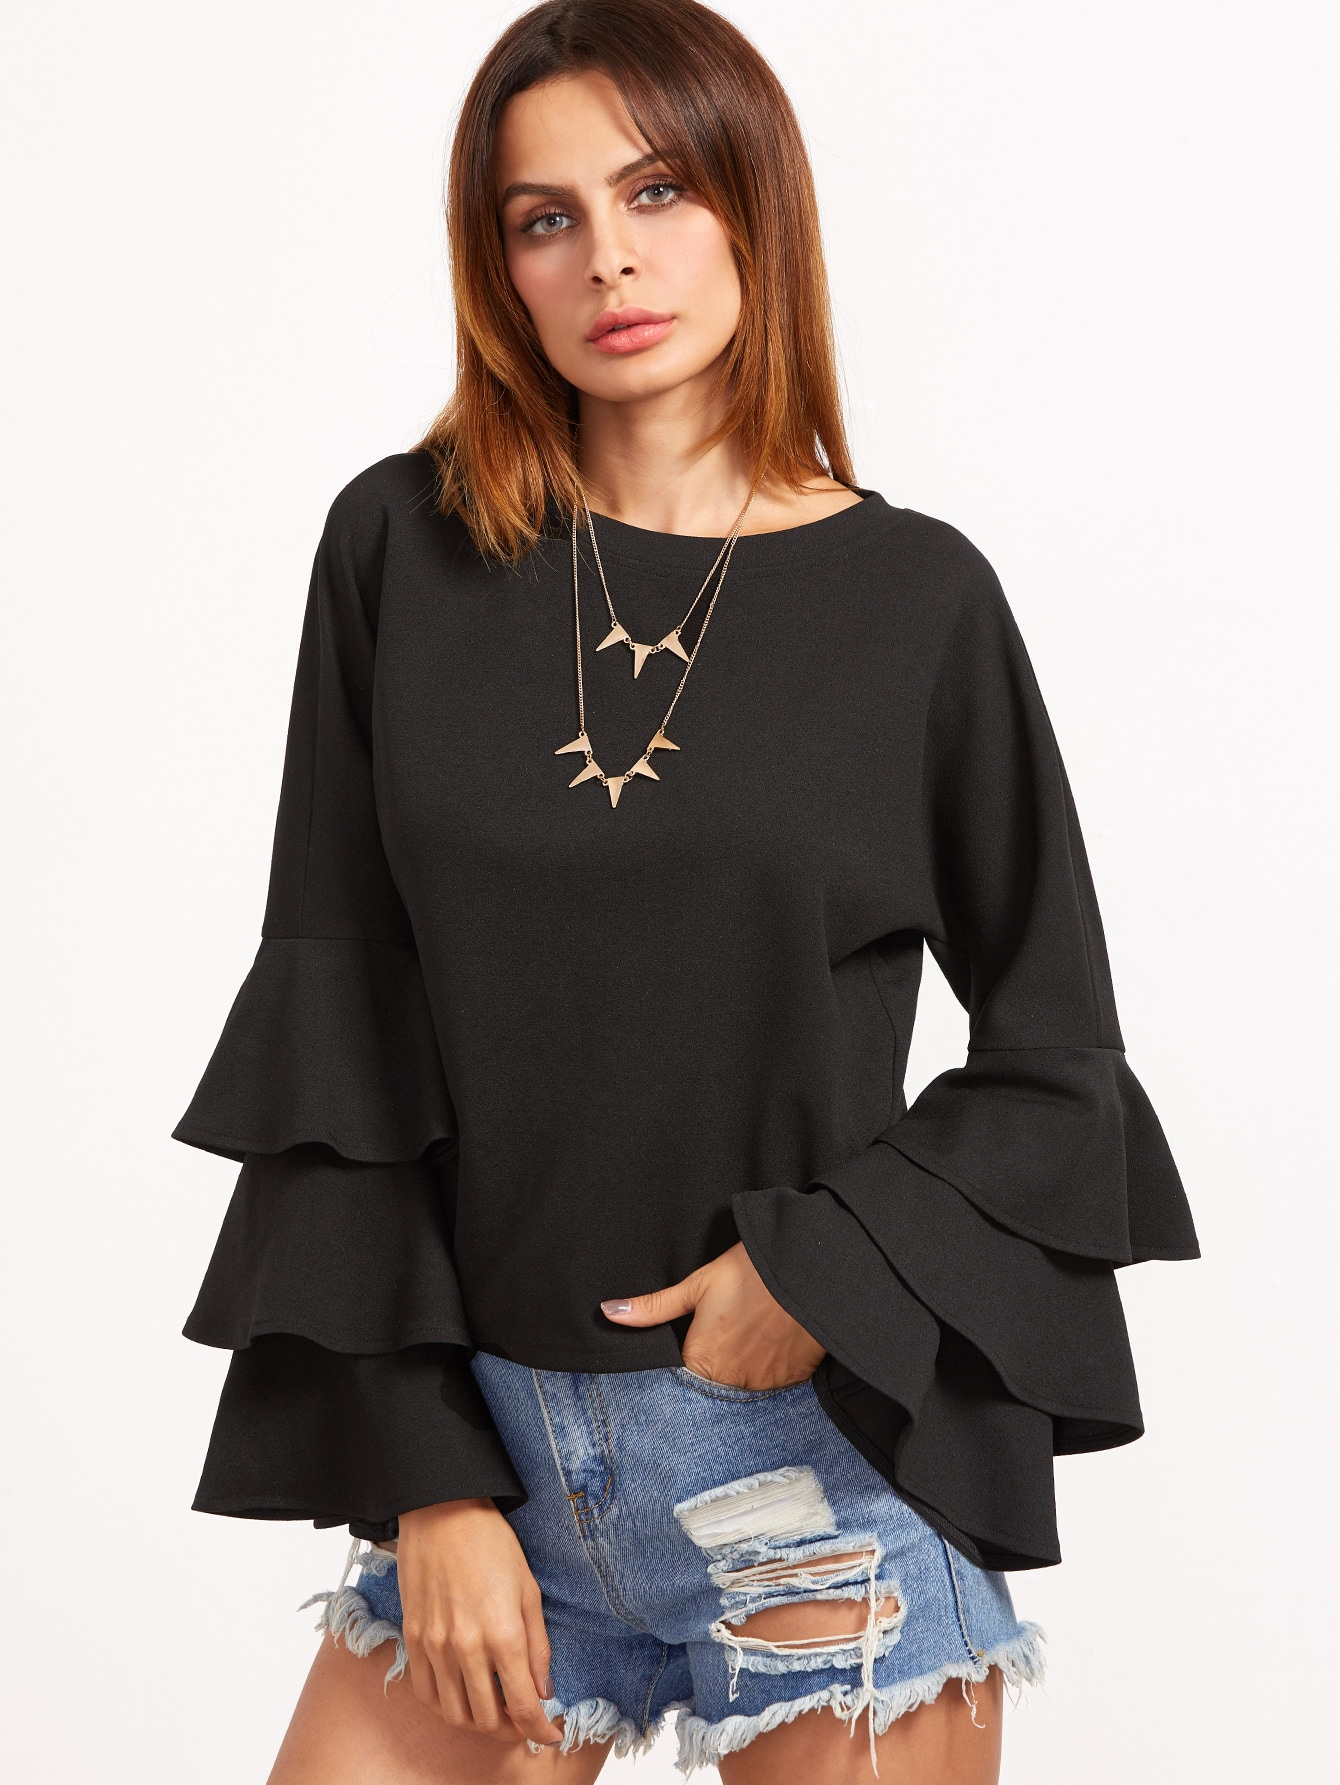 blouse161122709_2